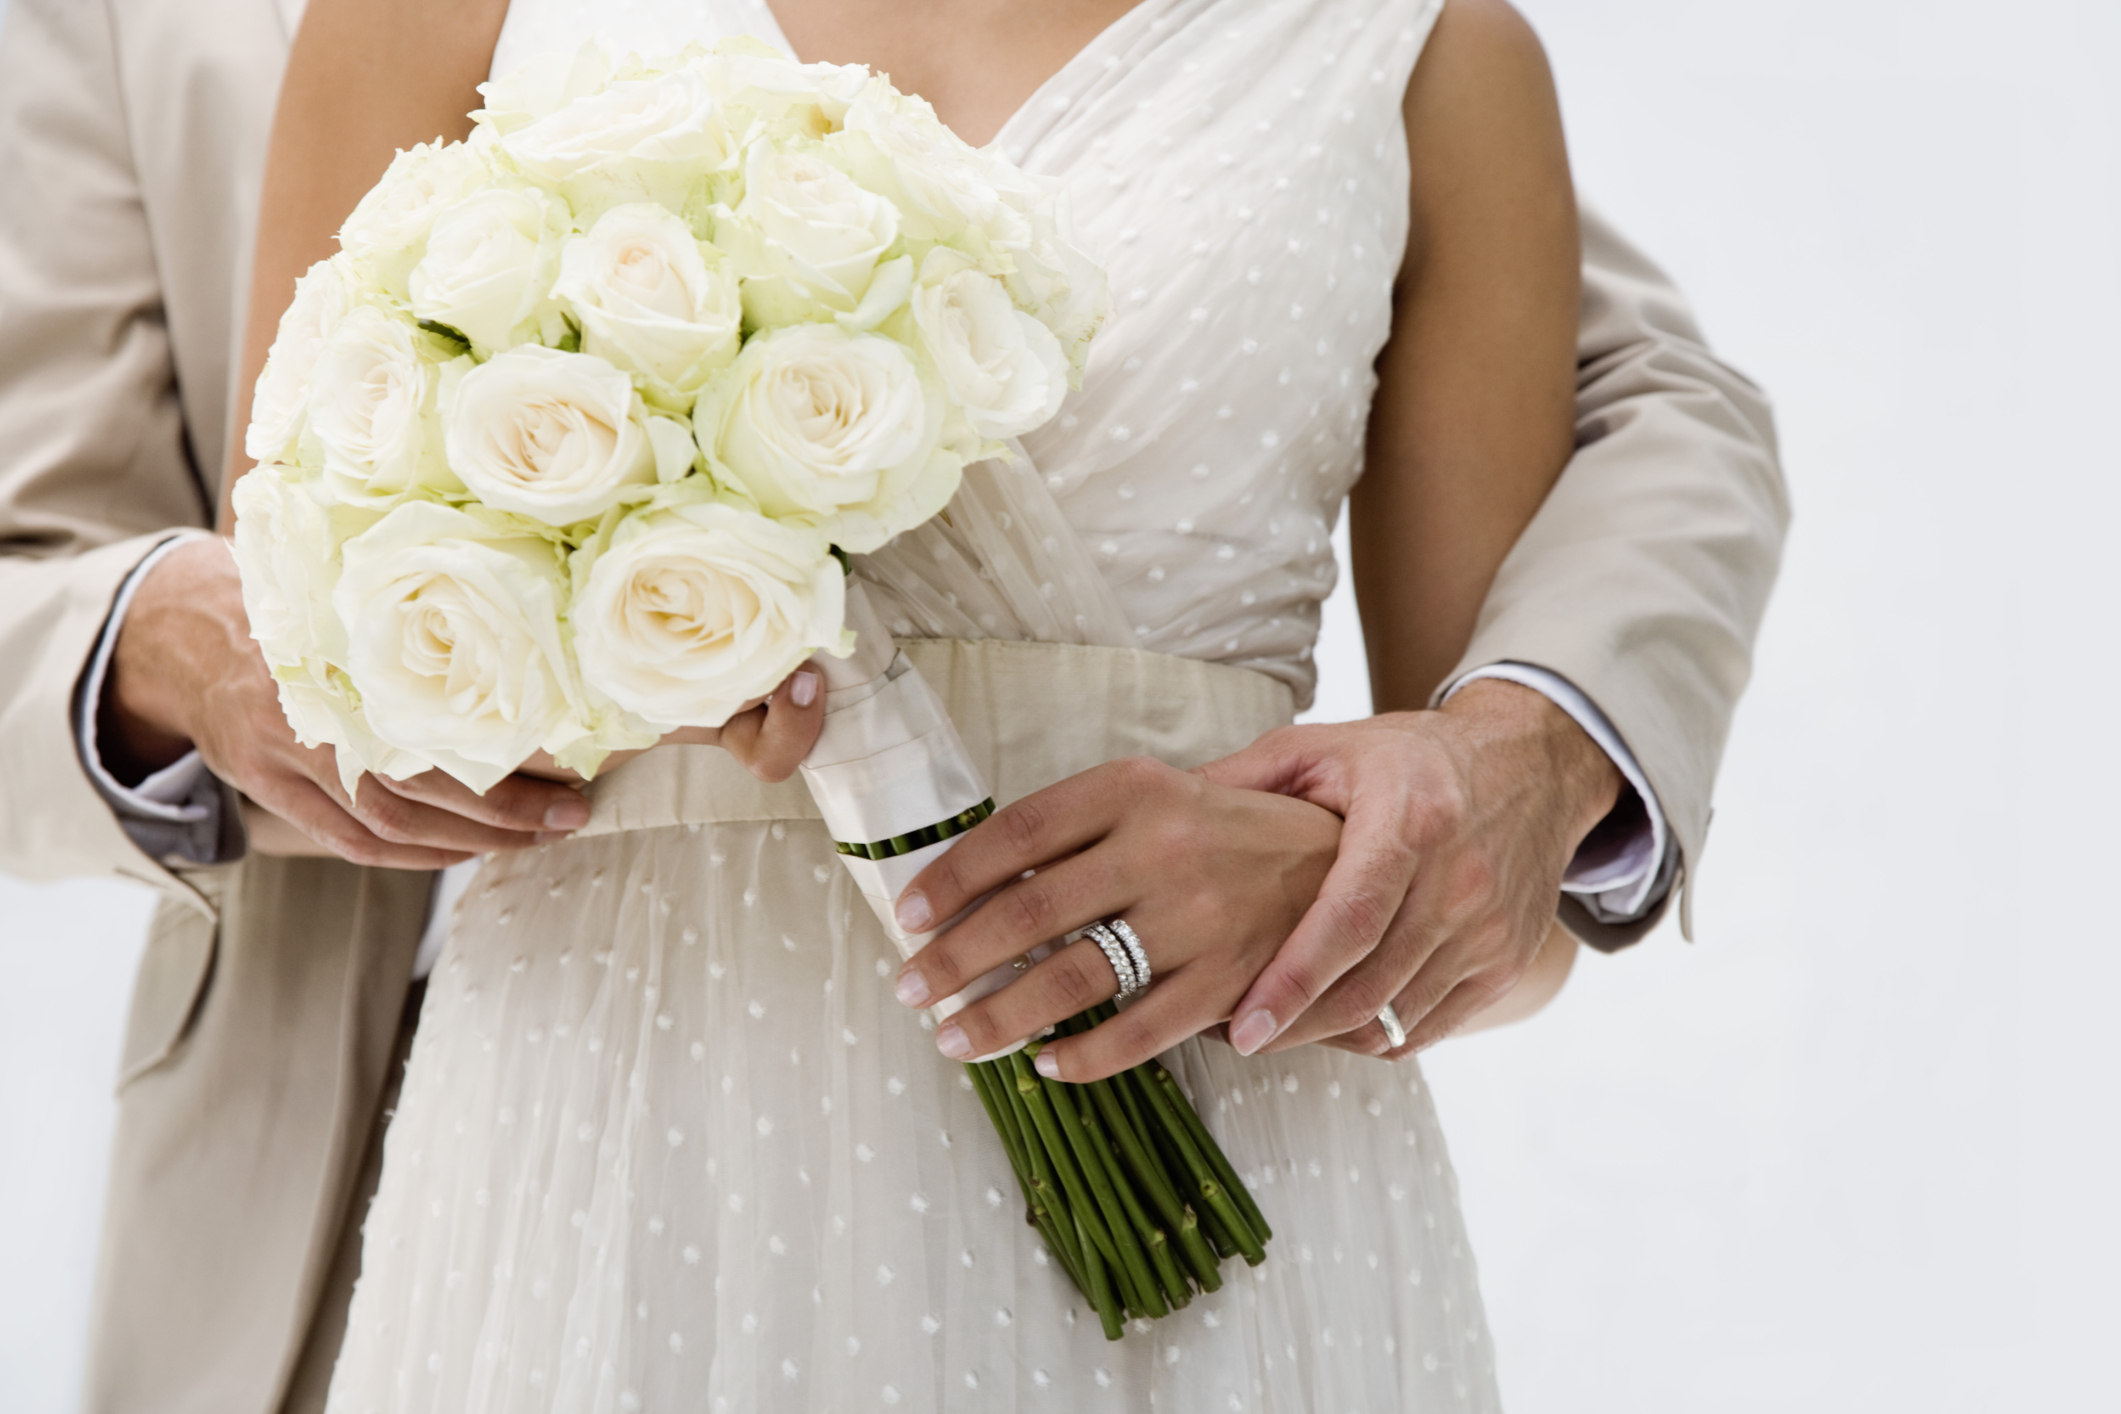 Ten popular bridal bouquet styles easy weddings uk bridal bouquet izmirmasajfo